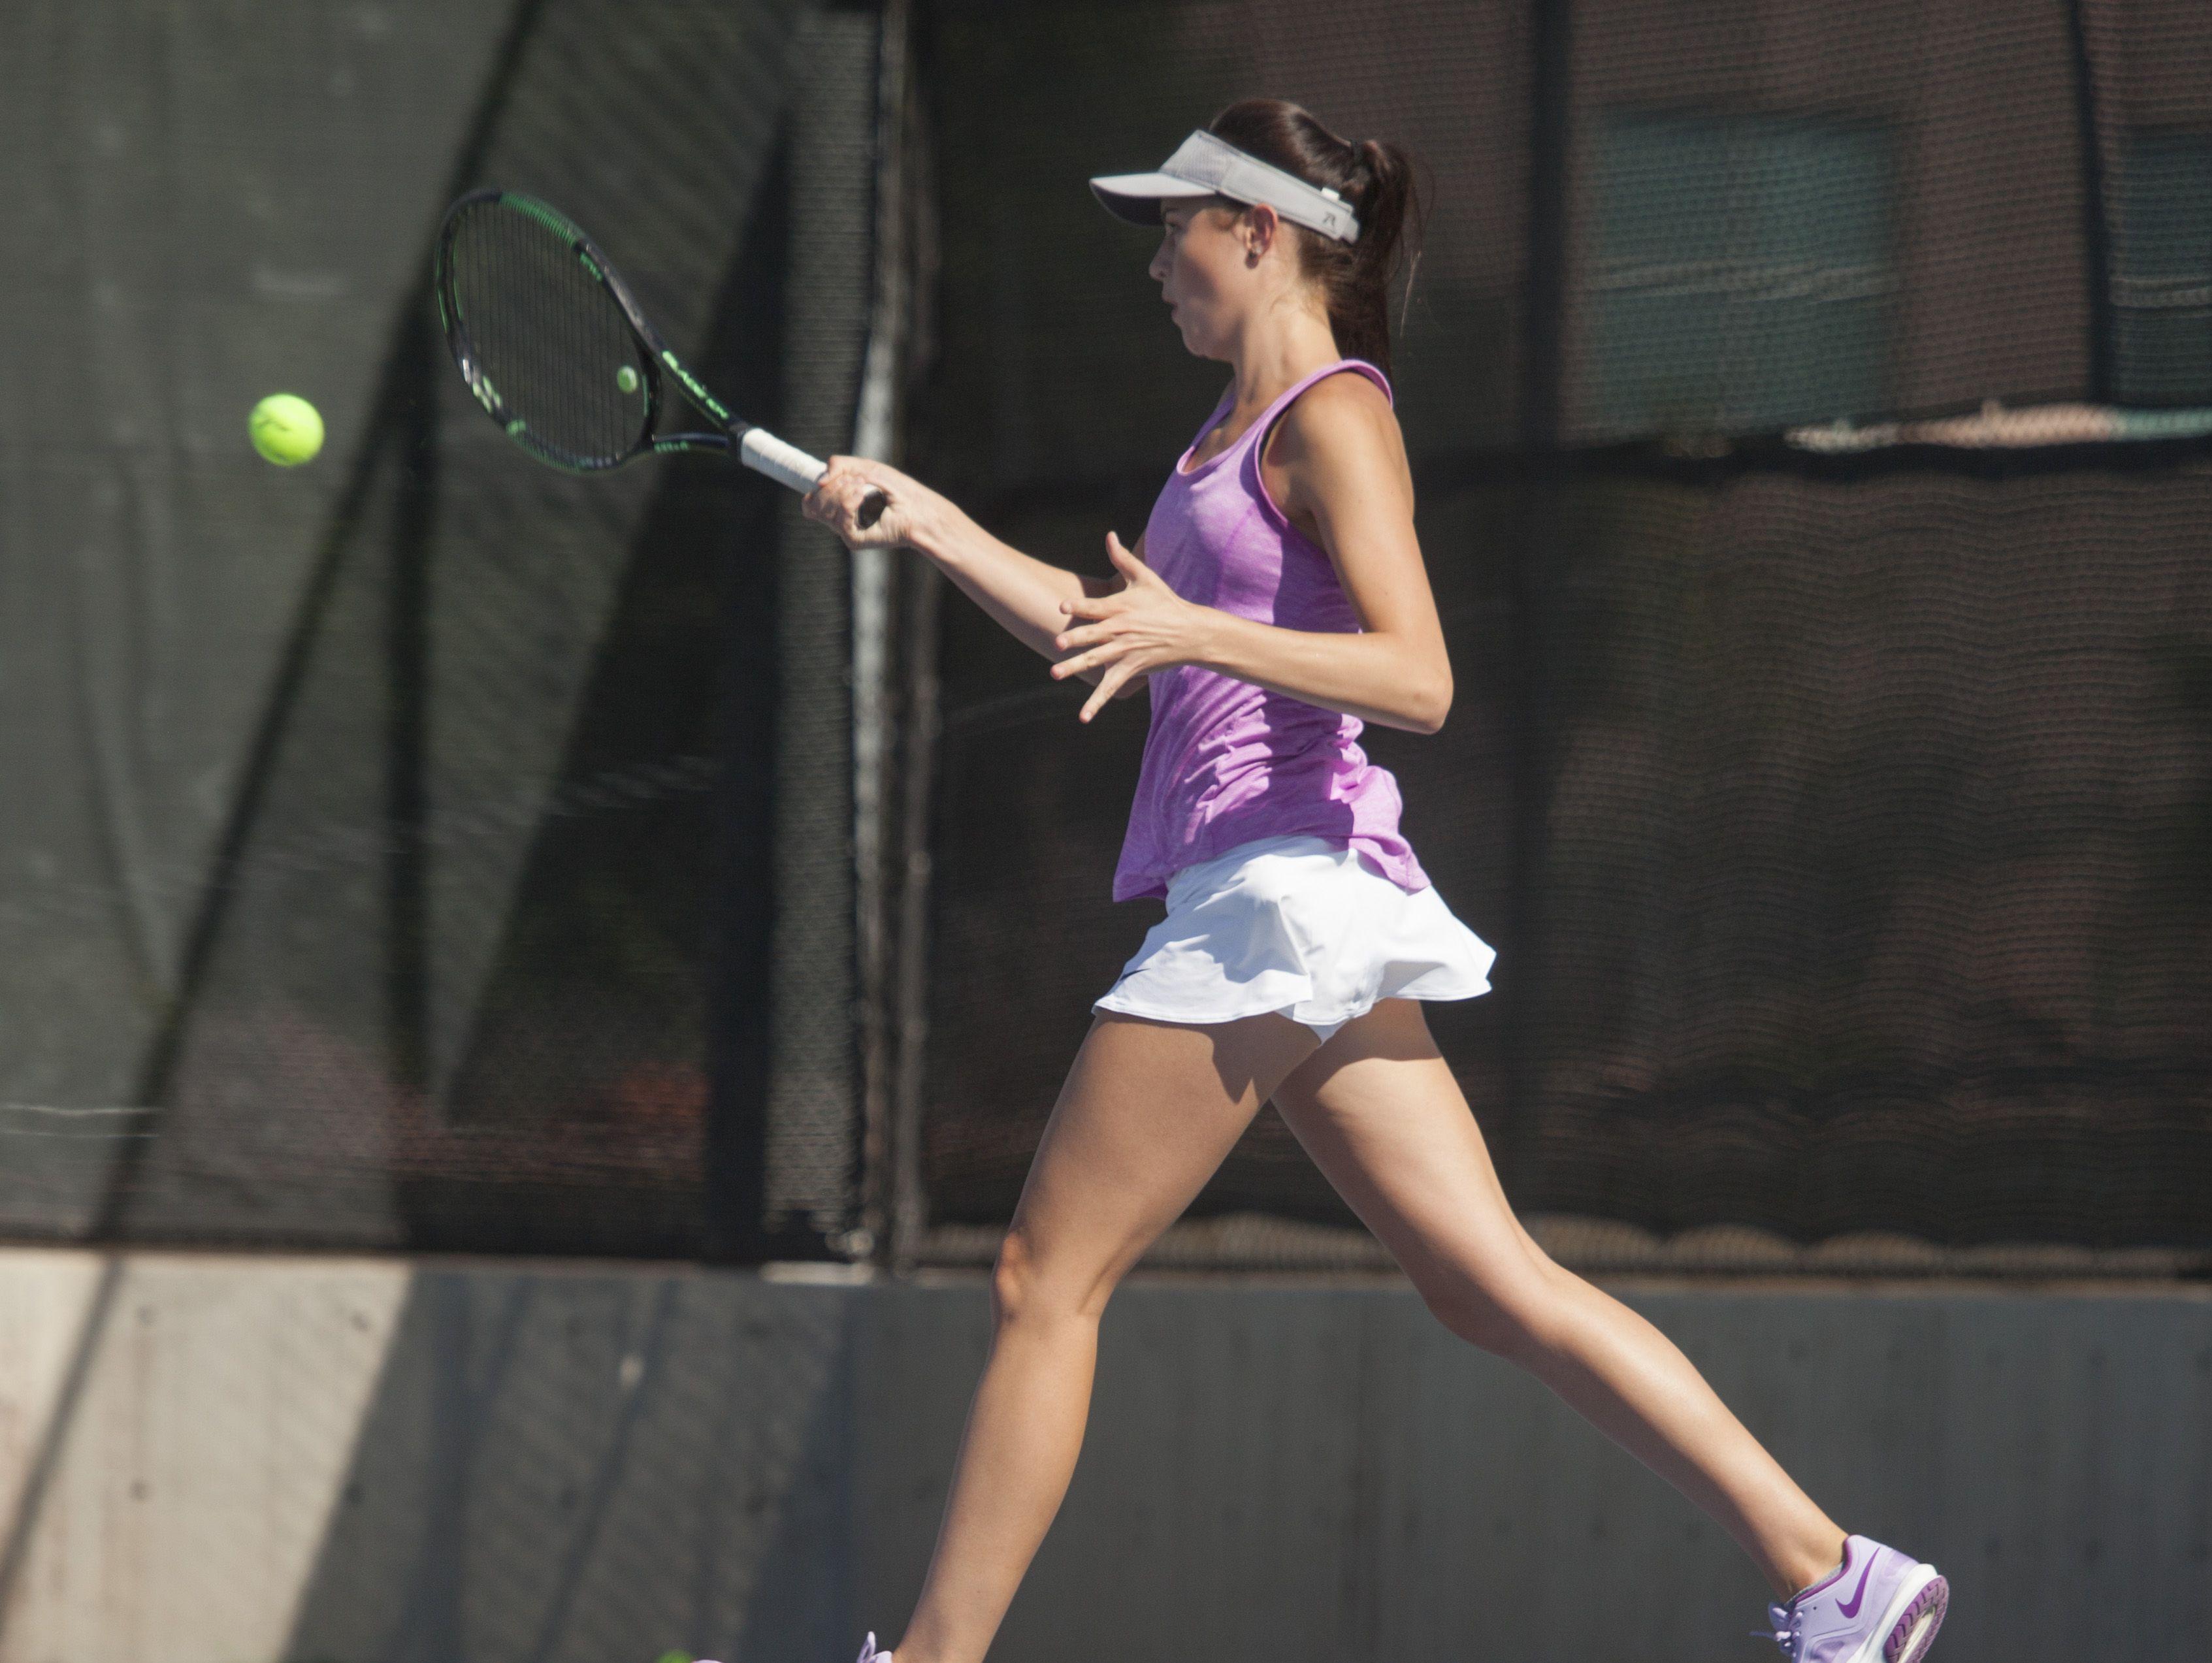 Desert Hills and Dixie girls tennis face off at the start of their season at Desert Hills High School Tuesday, August 16, 2016.